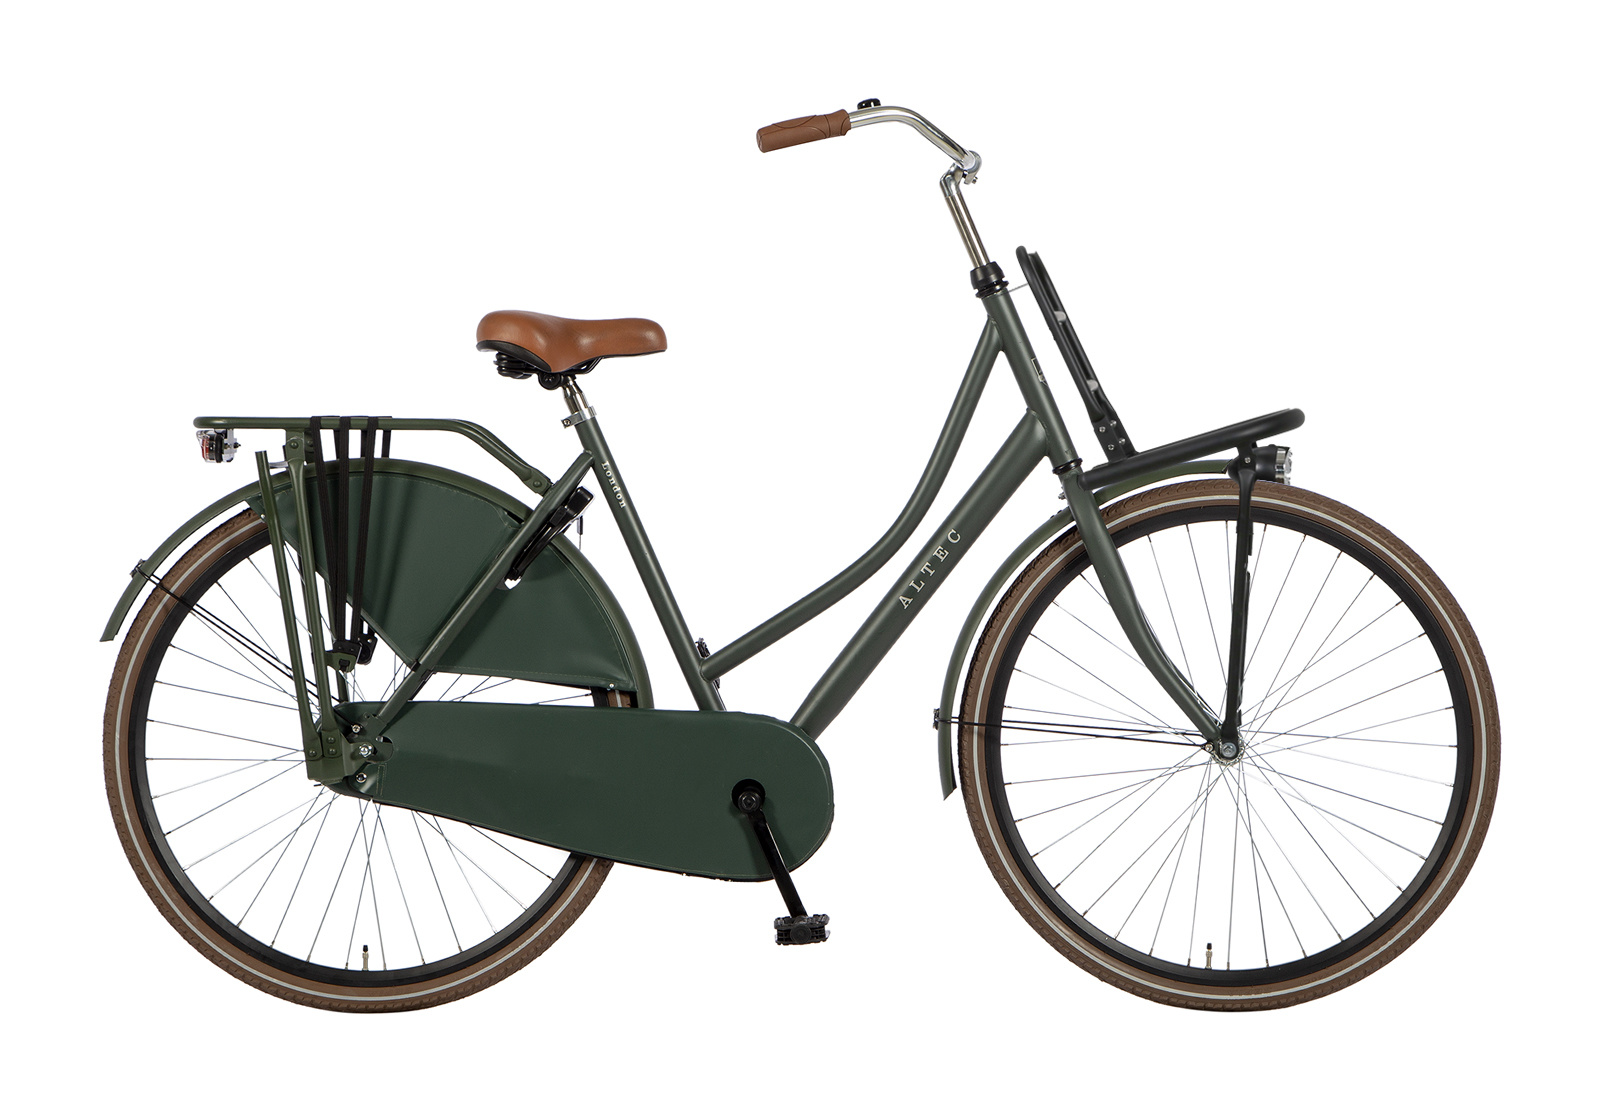 Altec Altec London DeLuxe Omafiets 28 inch 55cm Army Green